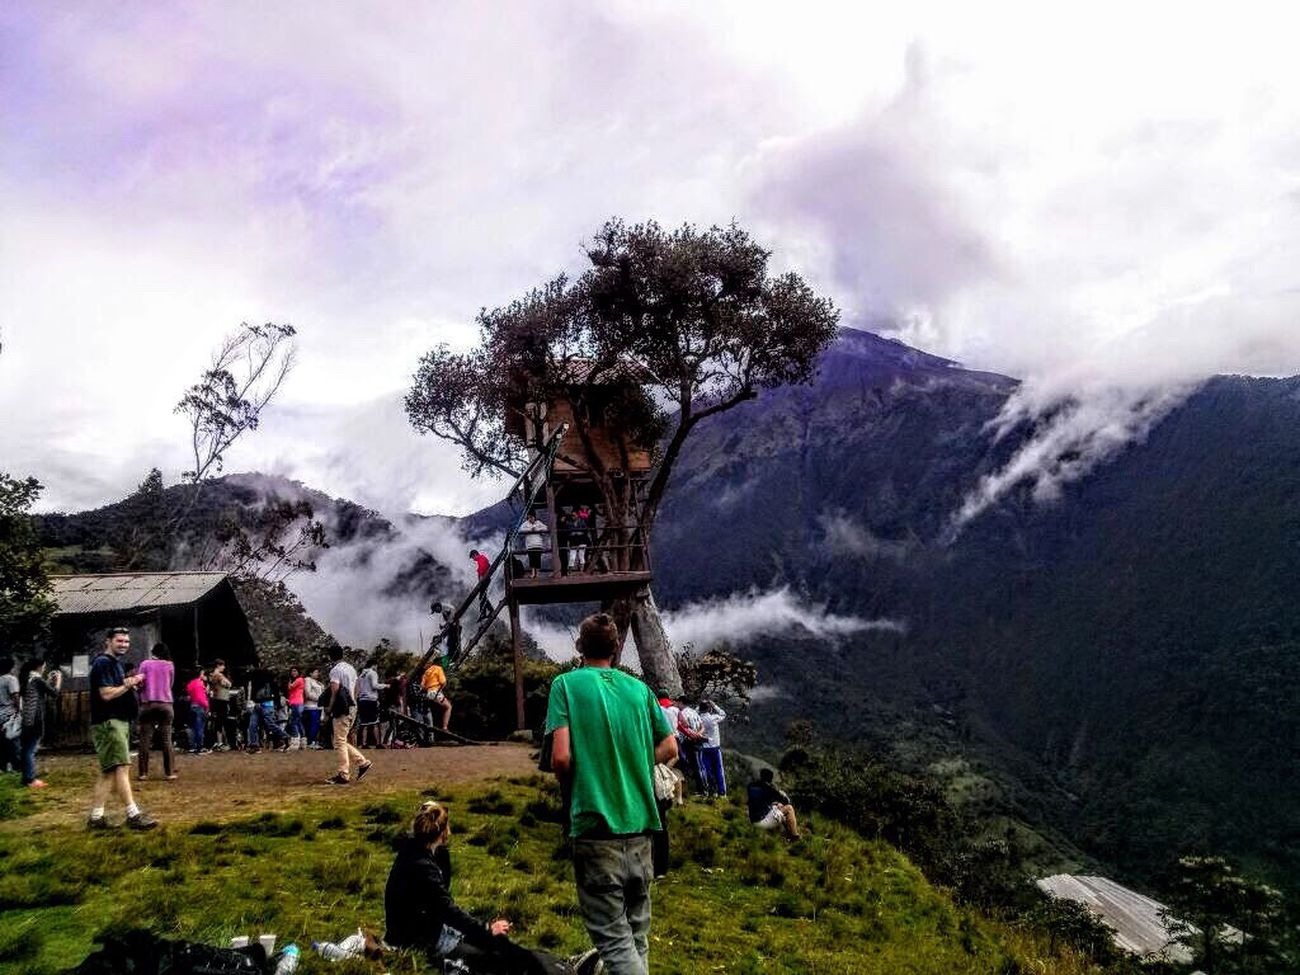 The Great Outdoors - 2016 EyeEm Awards BañosEcuador First Eyeem Photo